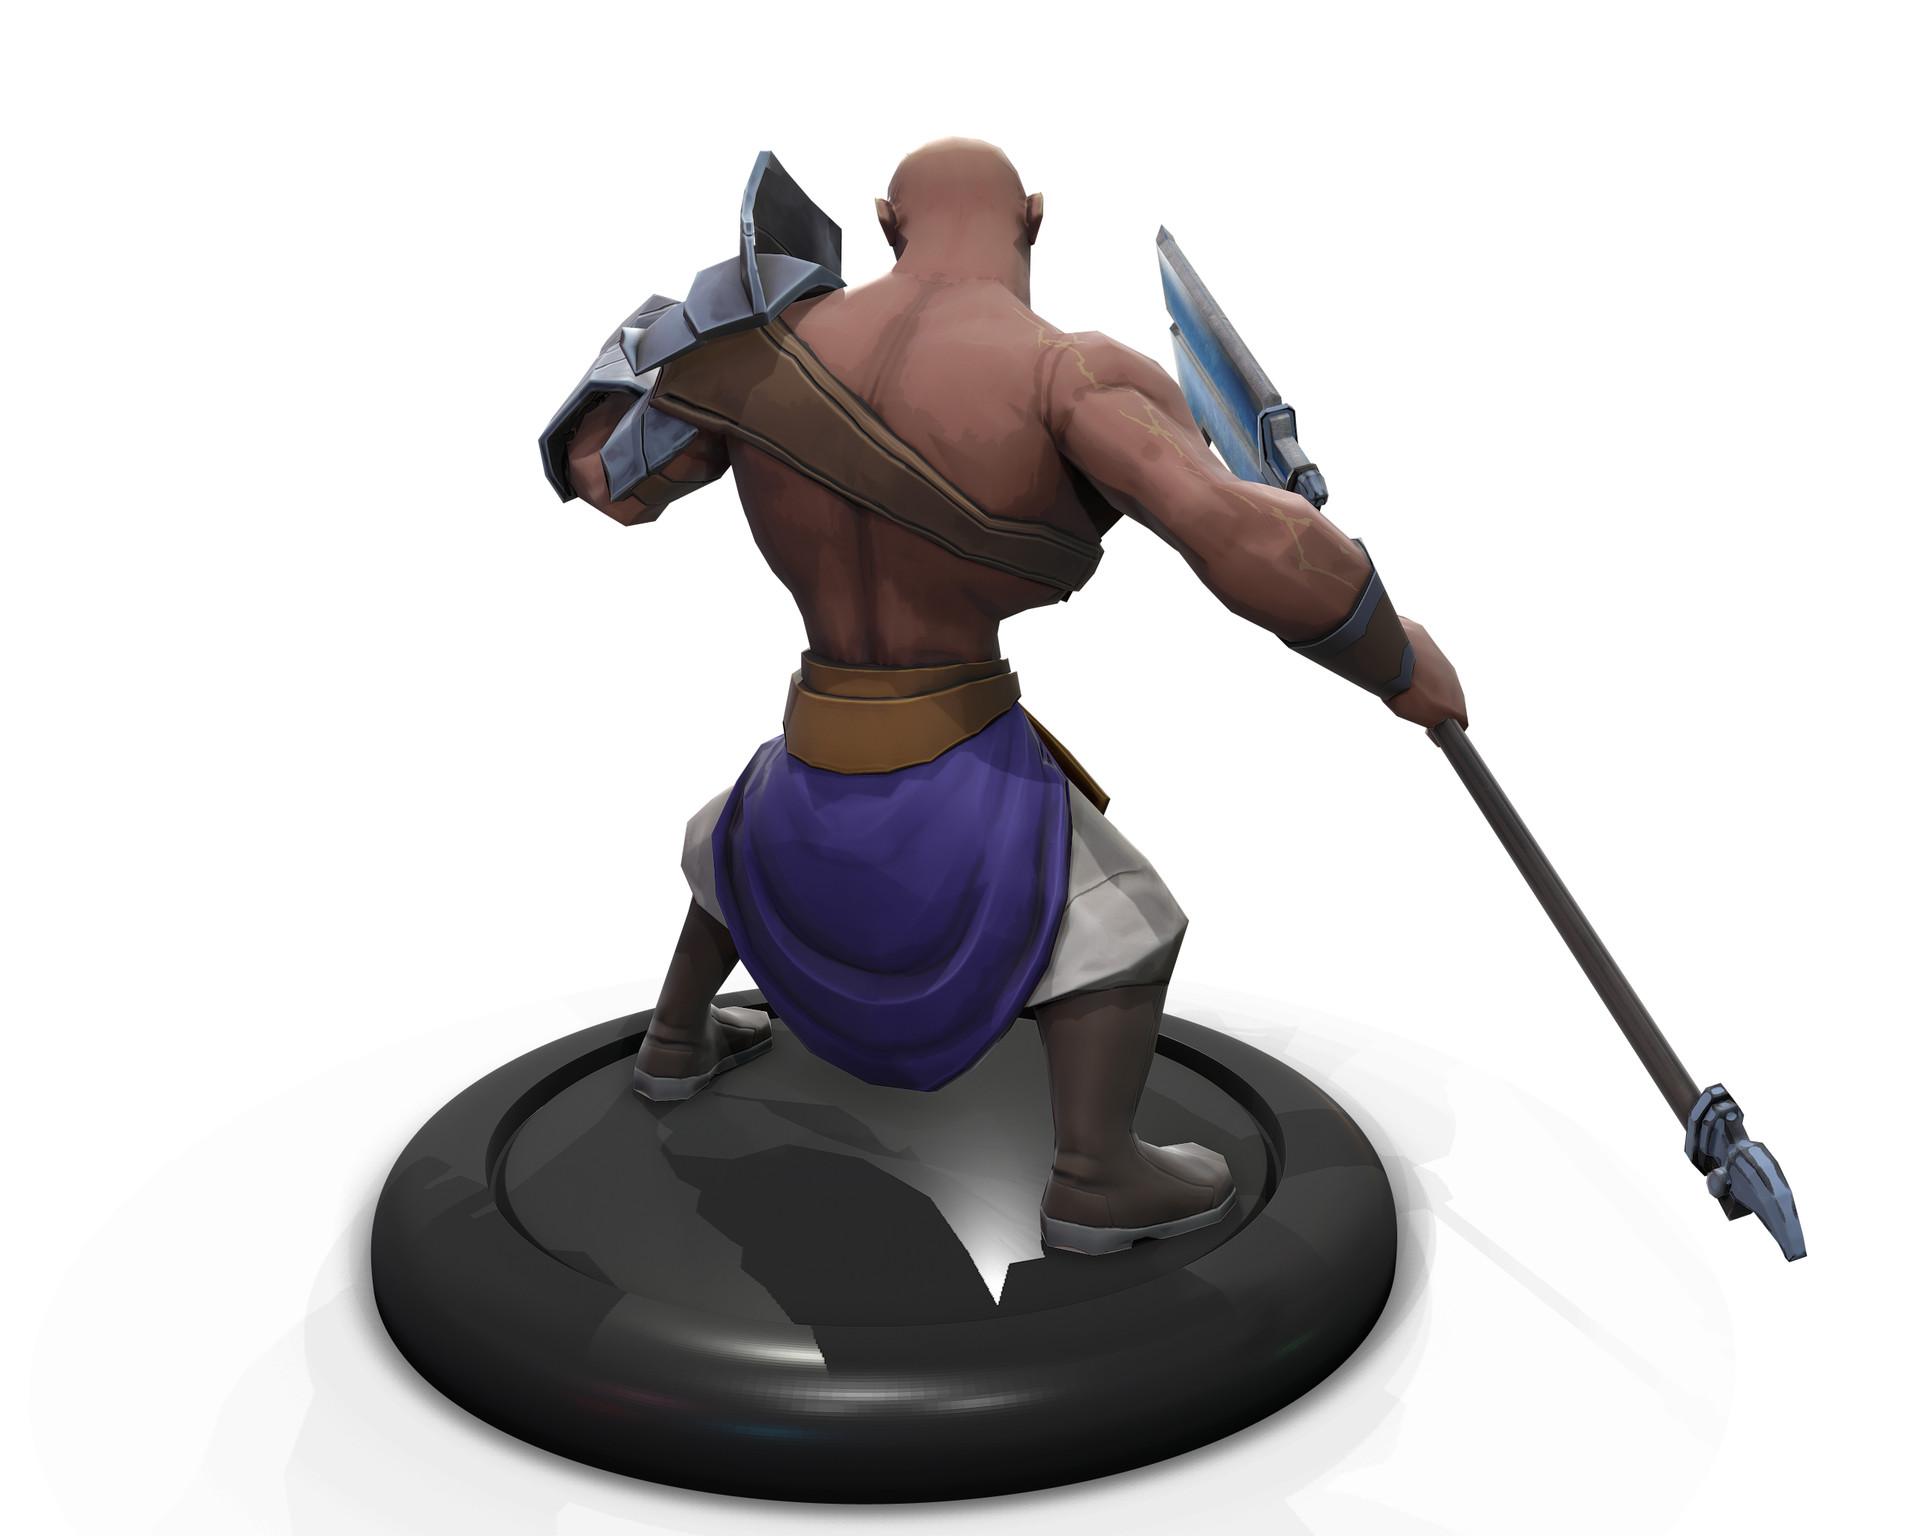 Nick bozarth kunorender 1